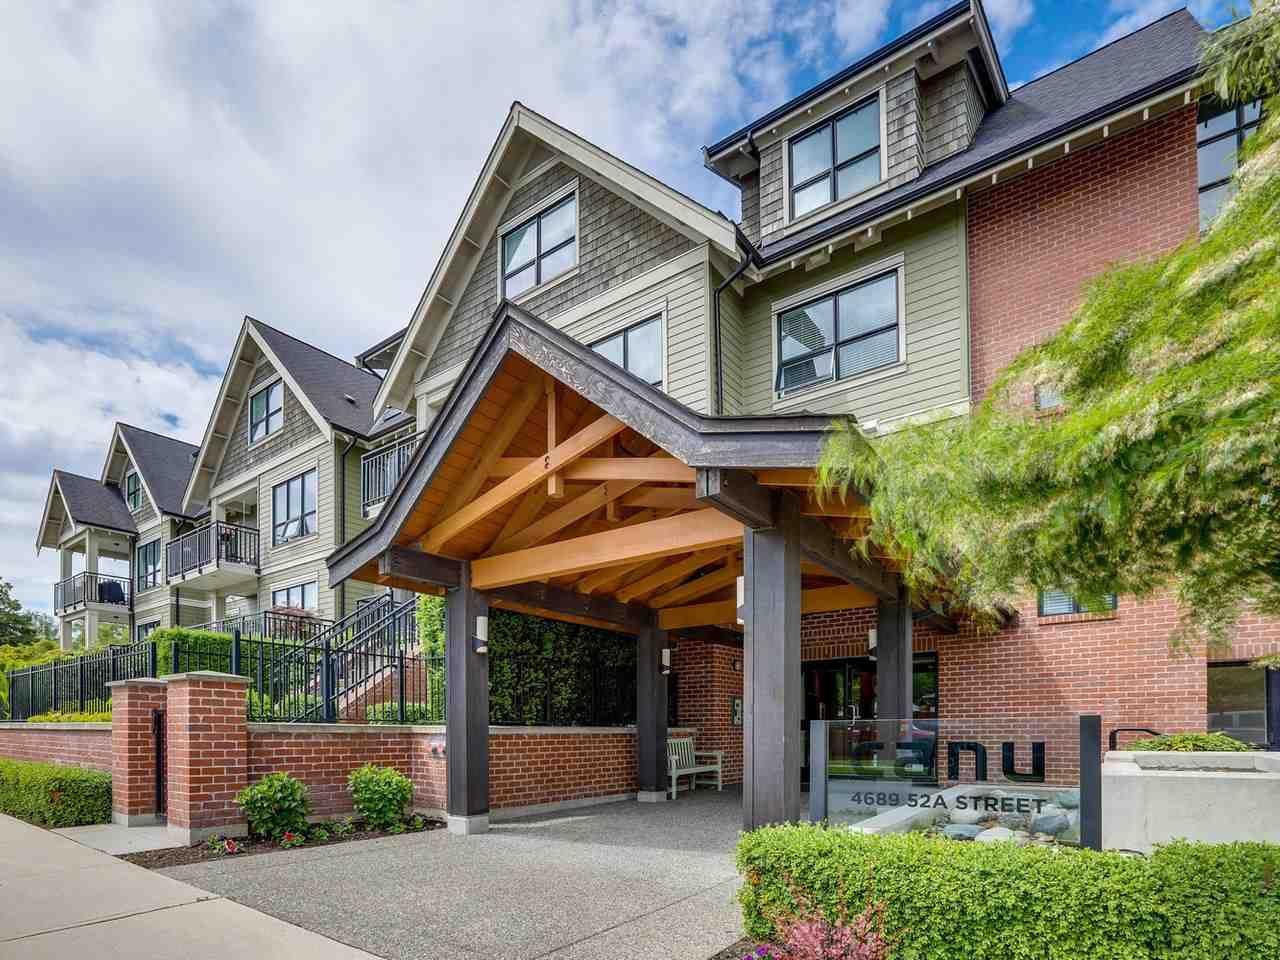 "Main Photo: 309 4689 52A Street in Delta: Delta Manor Condo for sale in ""CANU"" (Ladner)  : MLS®# R2463388"